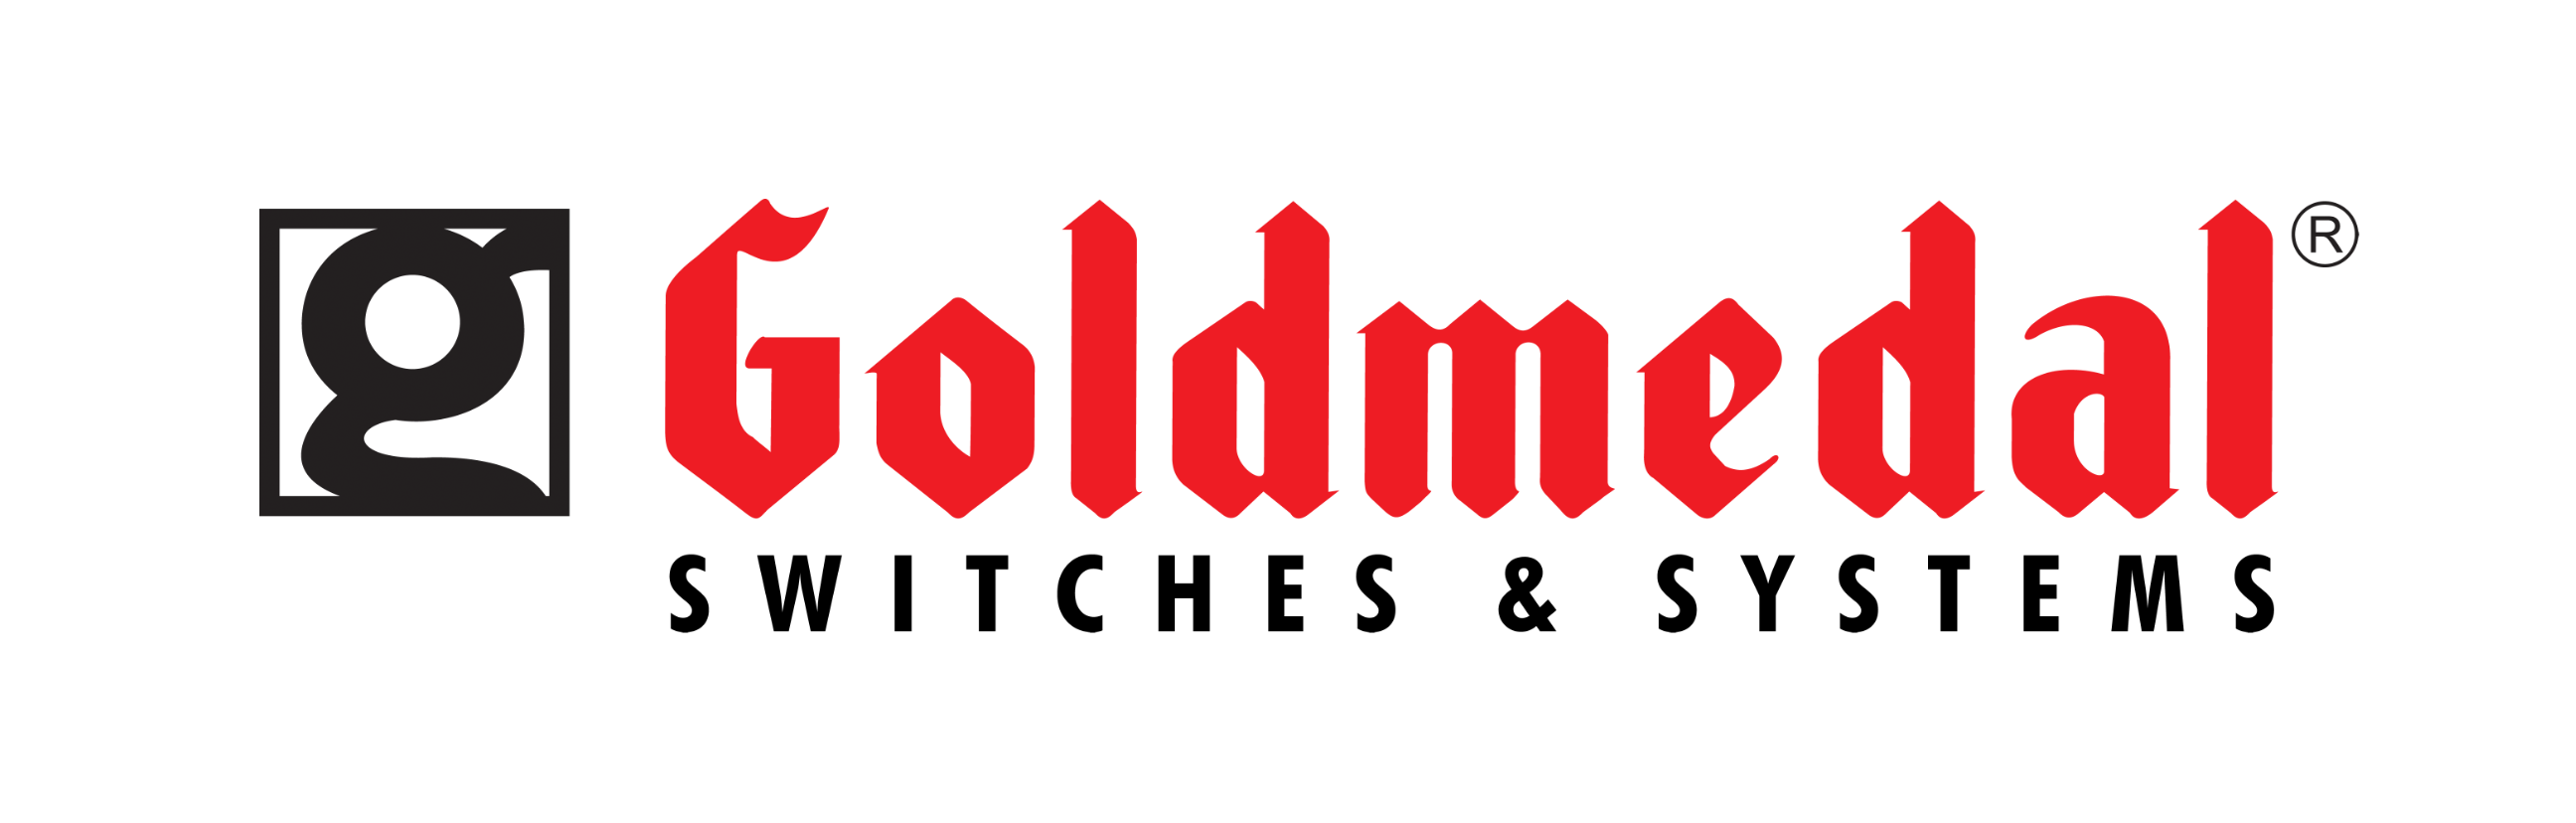 Goldmedal Logo By Glenna Balistreri Vector Logo Square Logo Picture Logo